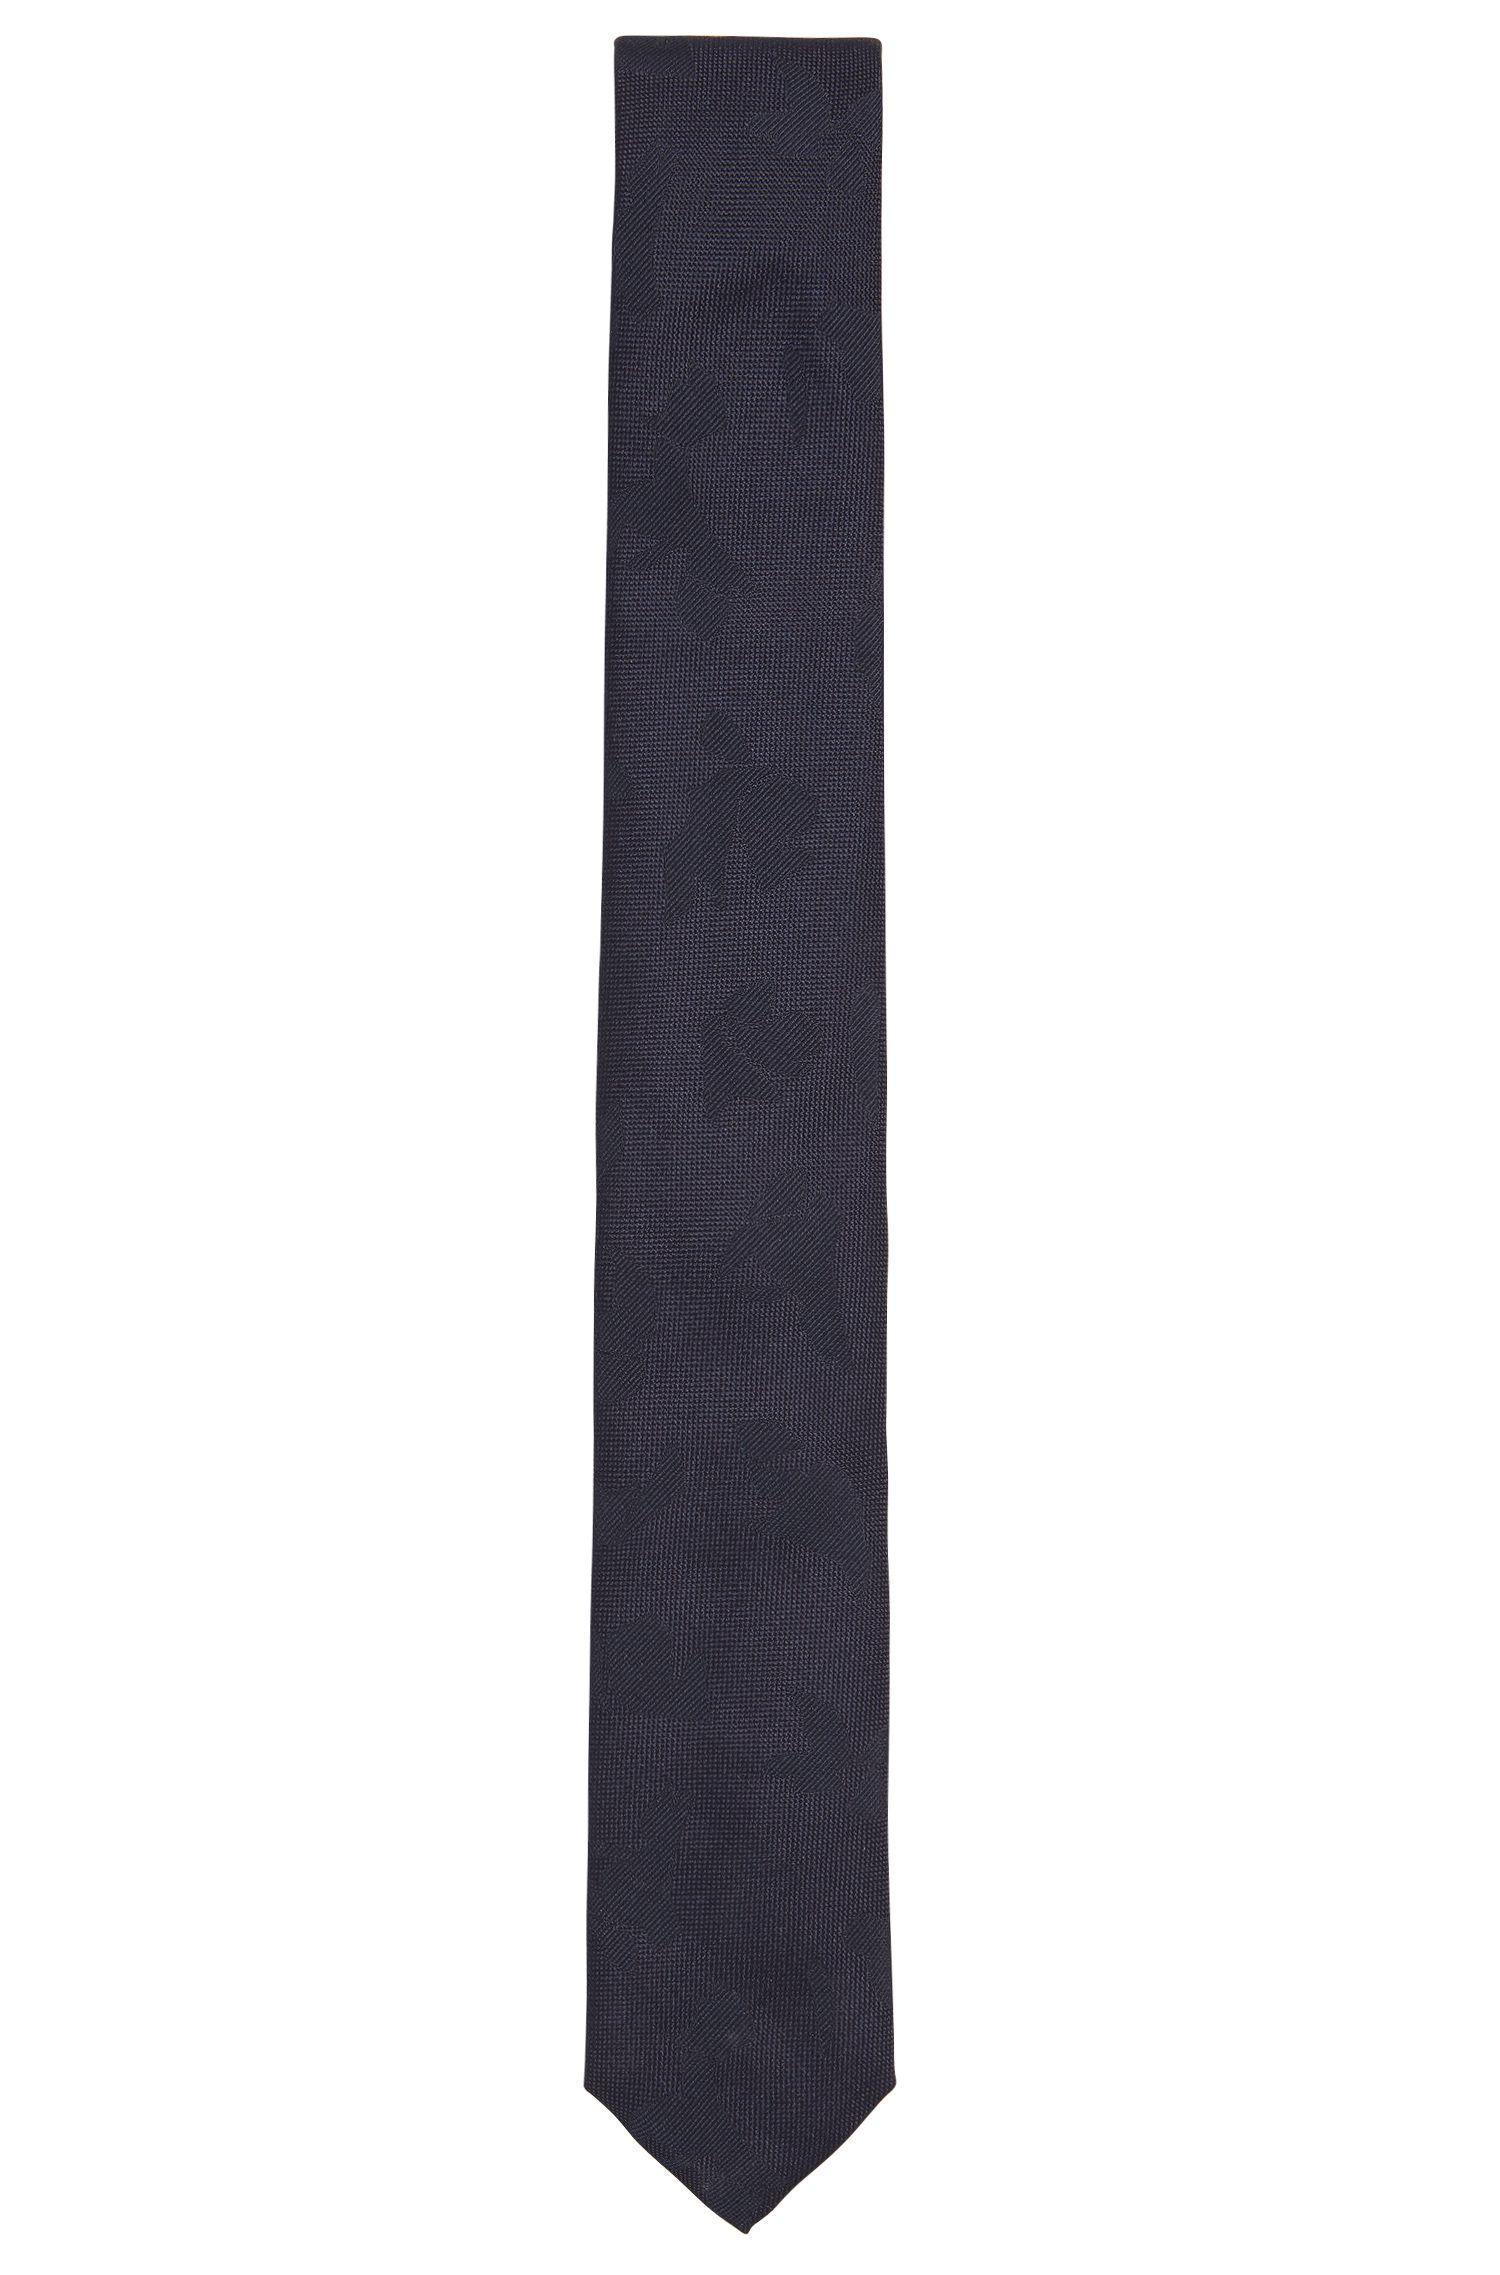 Zijden stropdas met abstract ton-sur-ton dessin